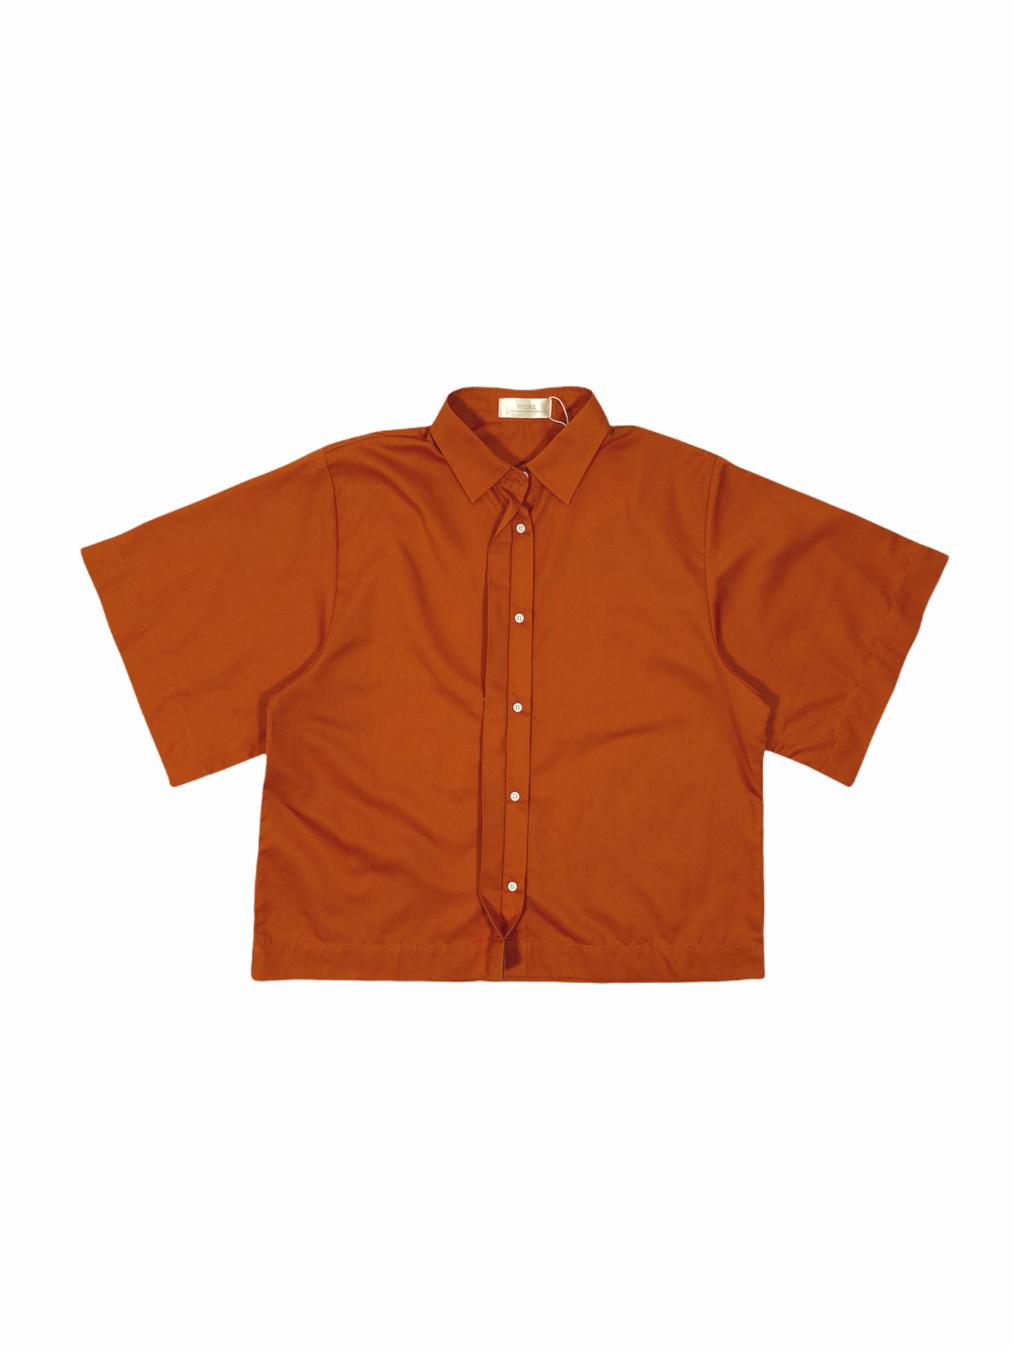 Ease Shirt (Kimji)